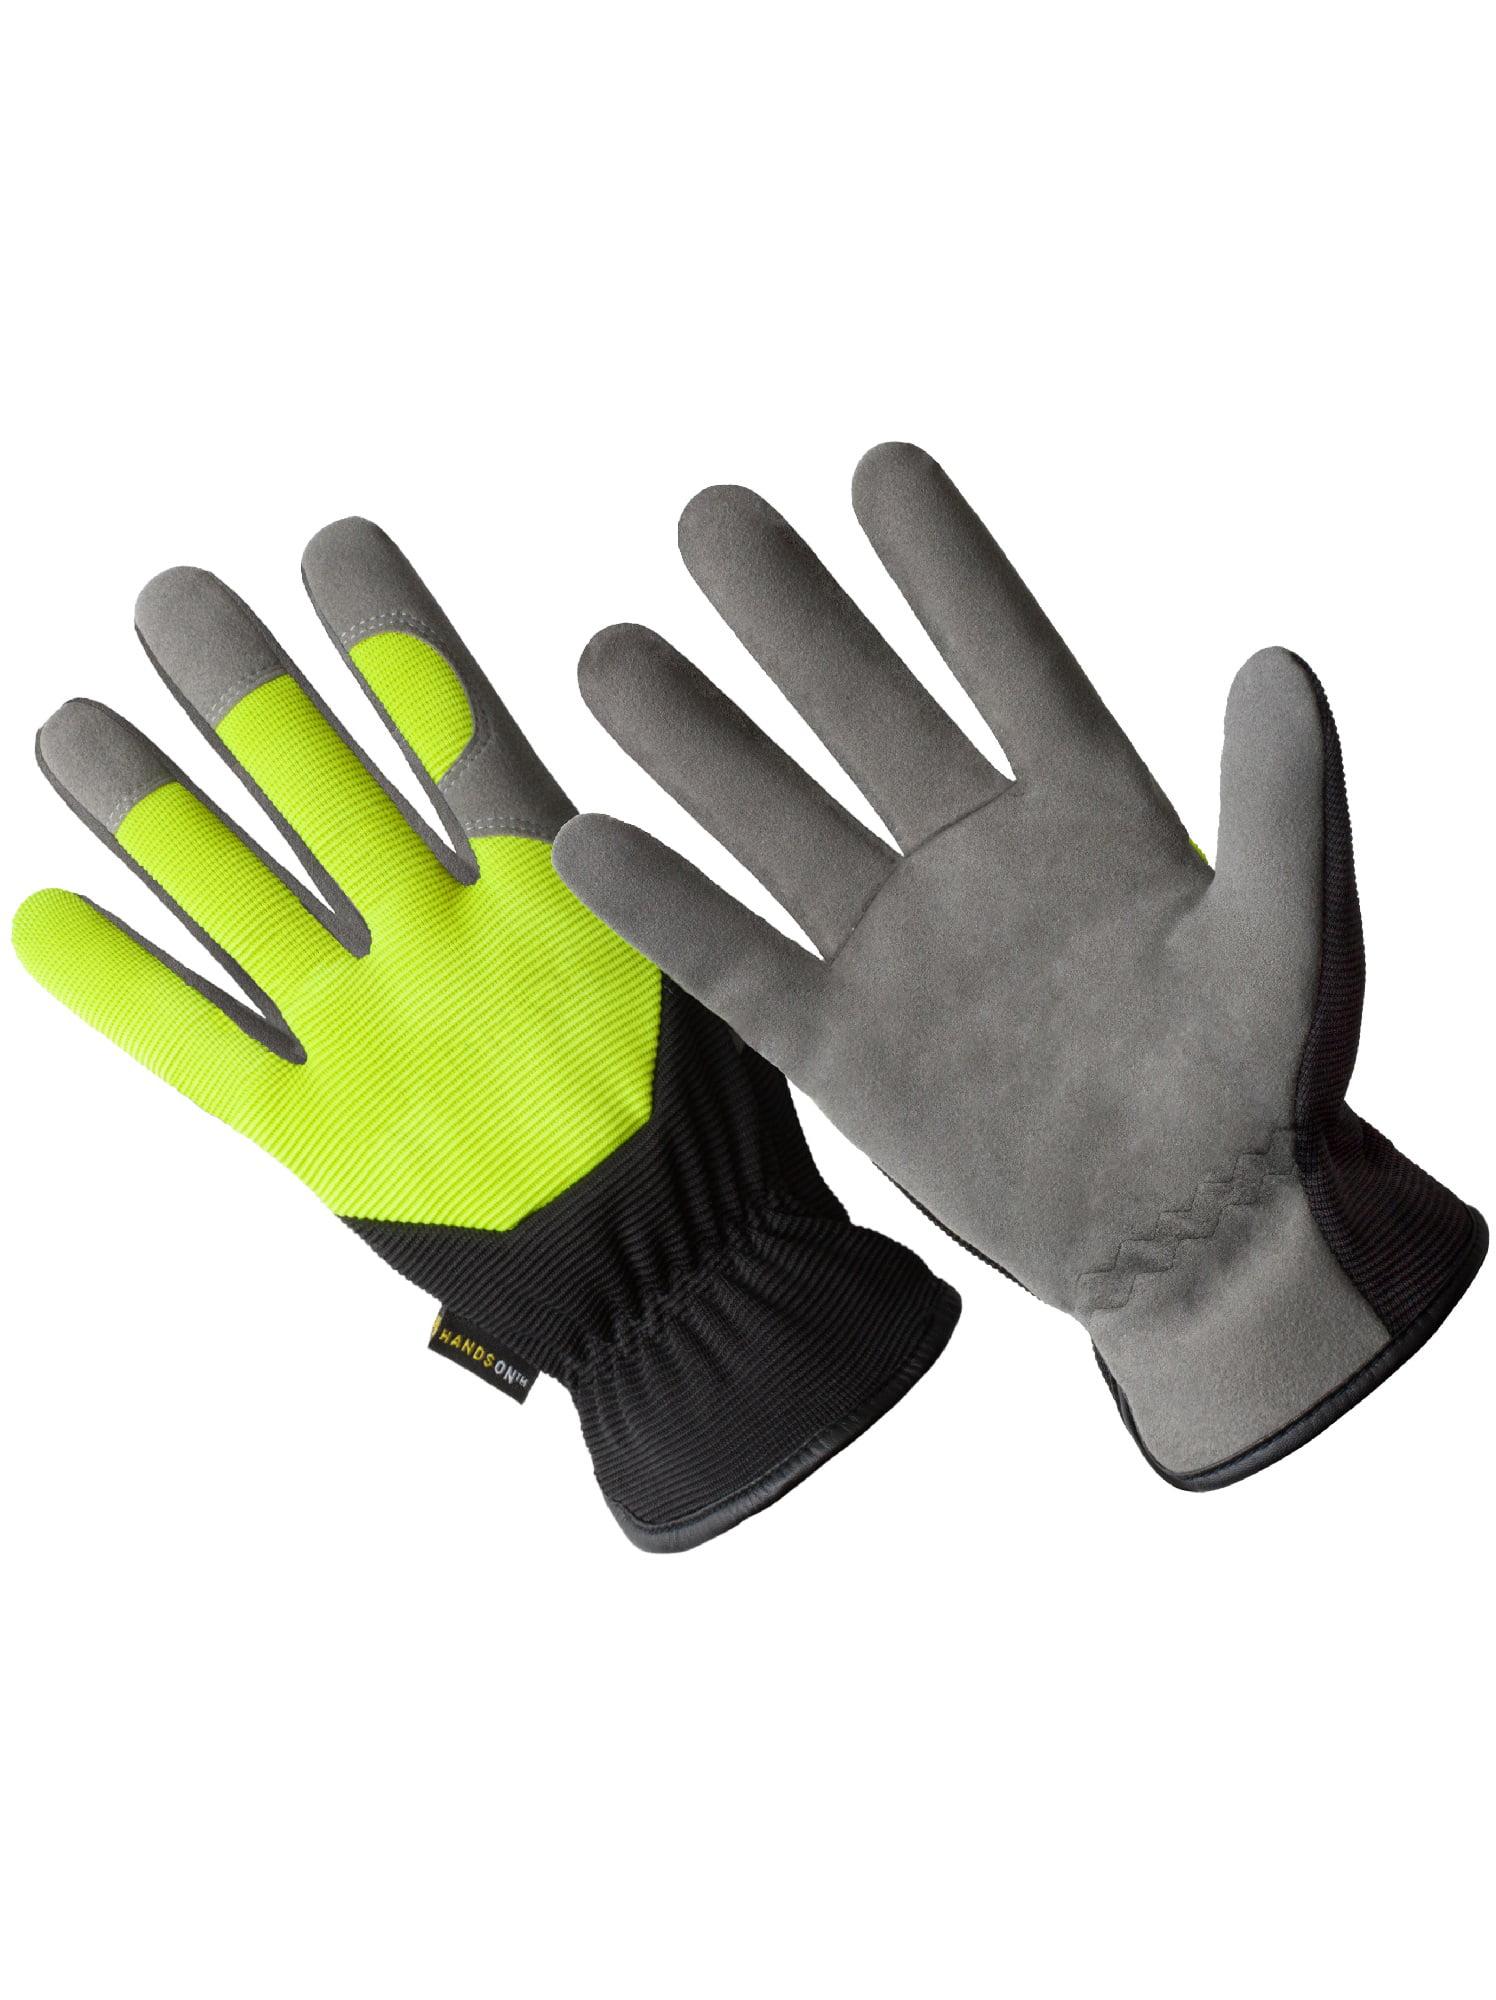 HD0002-M, Slip-On Synthetic Leather Hi-Dexterity Washable Work Glove, Black/Hi-Viz Green